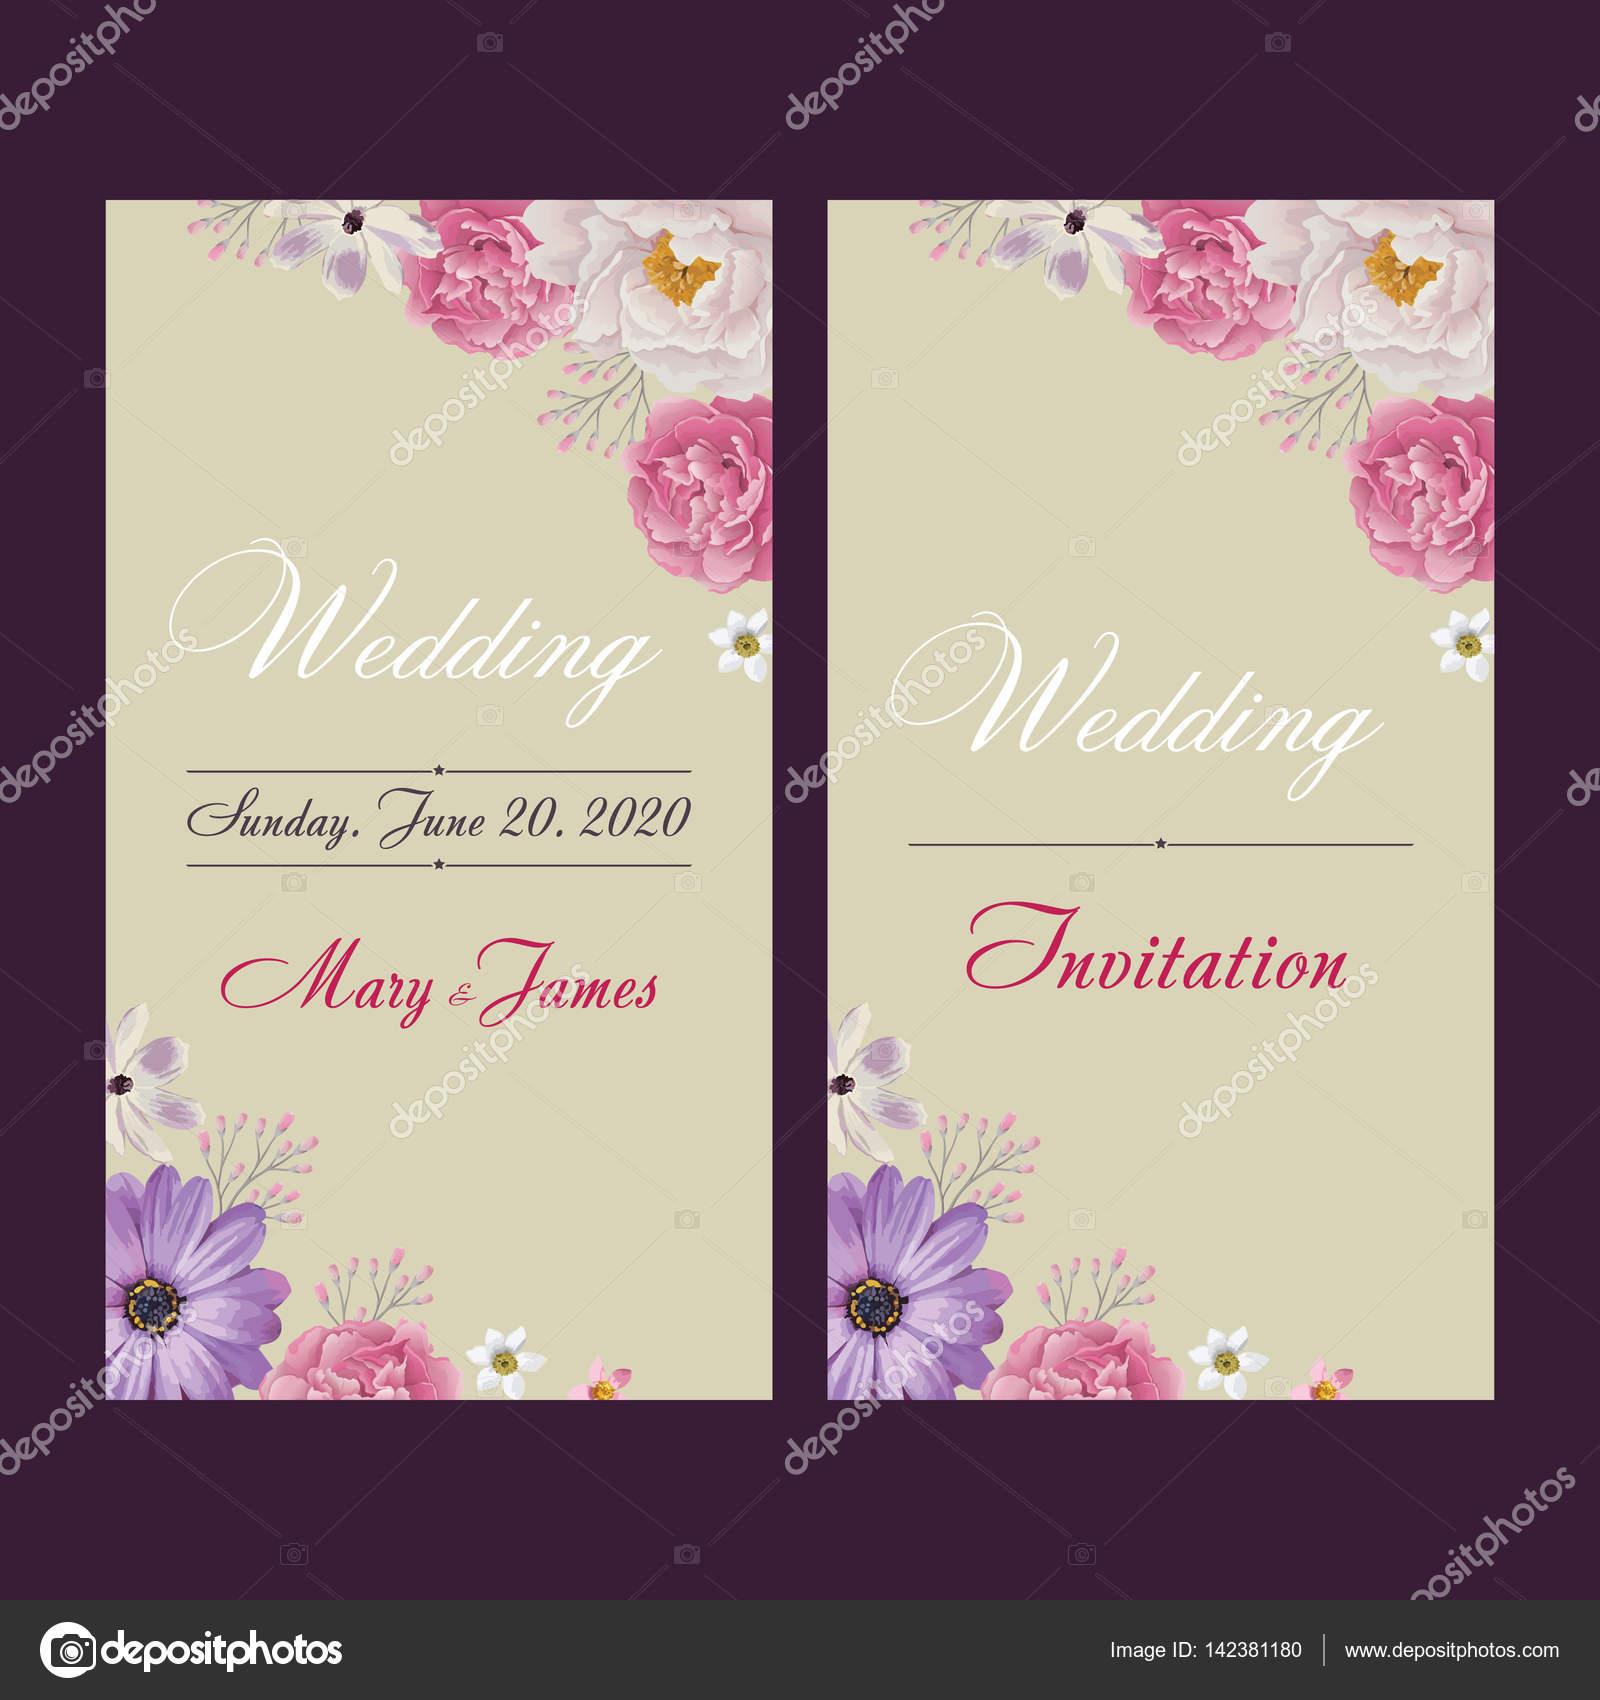 Wedding invitation thank you card save the date cards eps 10 wedding invitation thank you card save the date cards eps 10 stock stopboris Choice Image